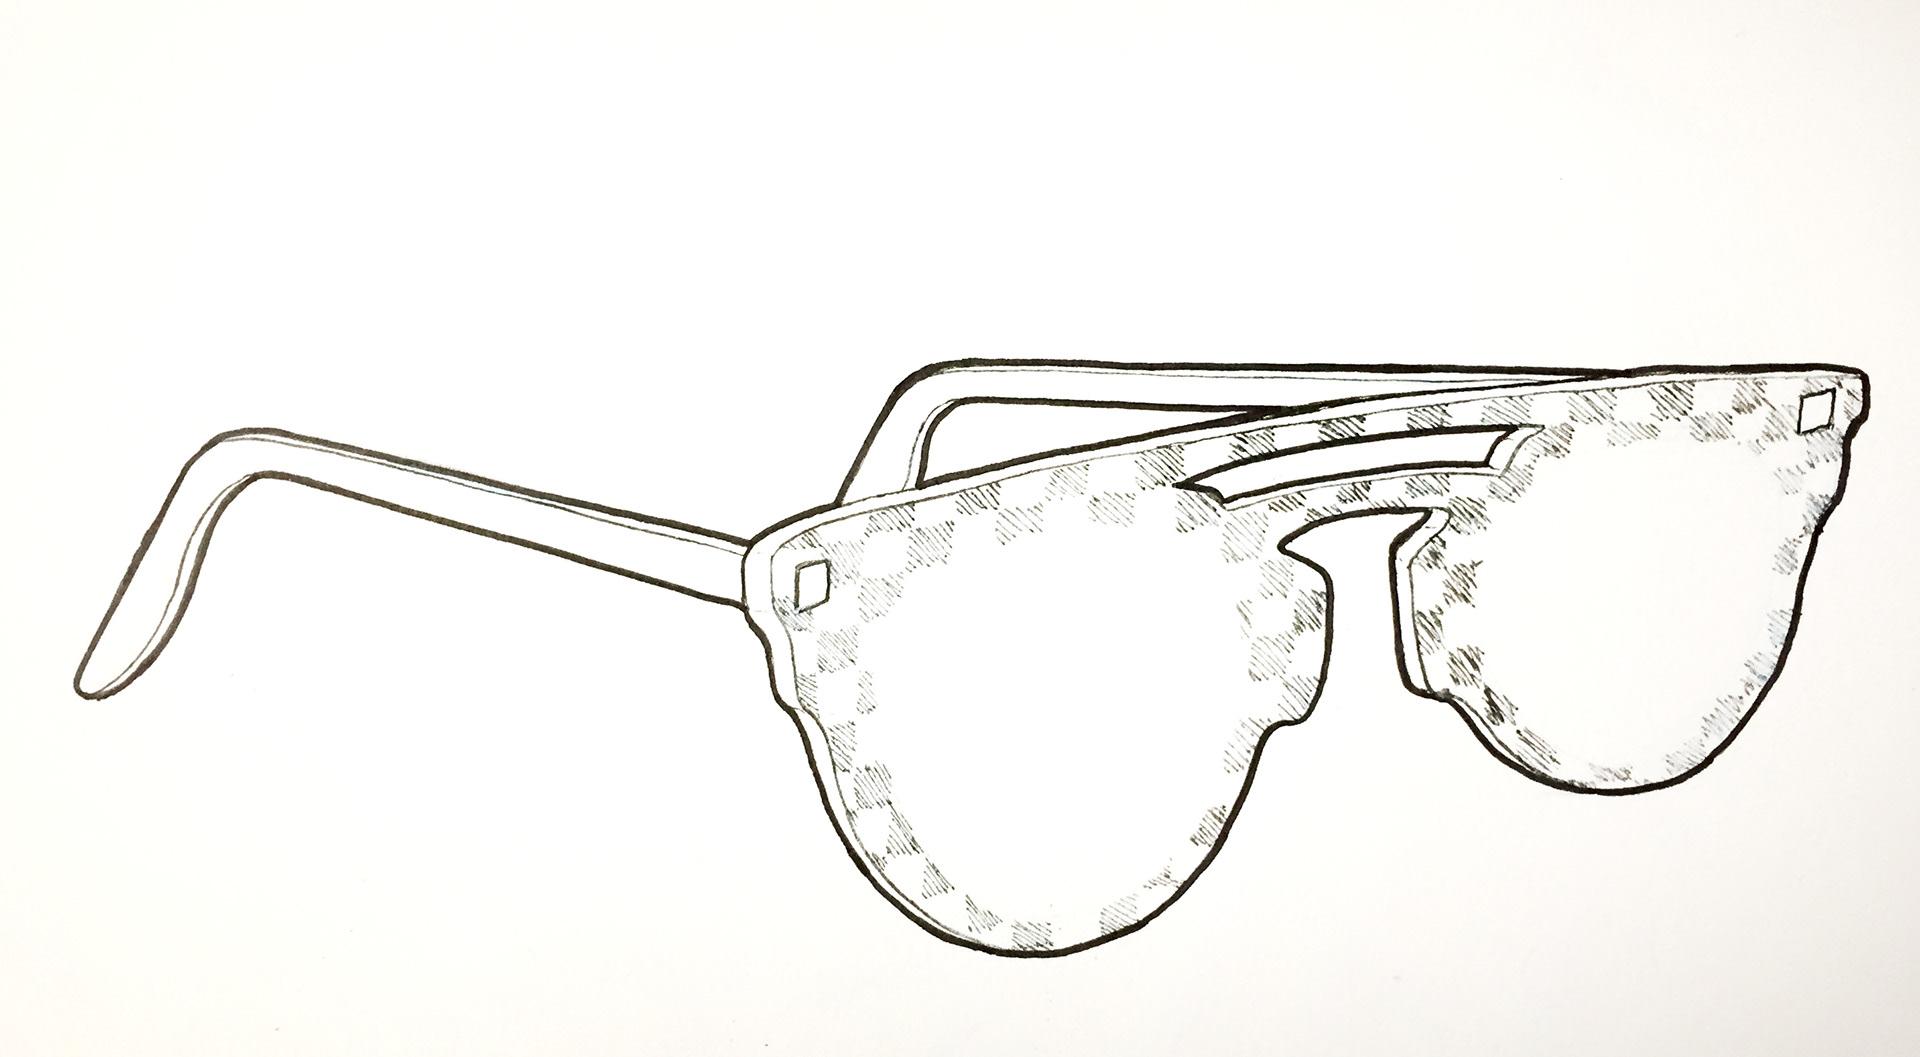 Riya Mehta - Laser Cut & 3D Printed Glasses